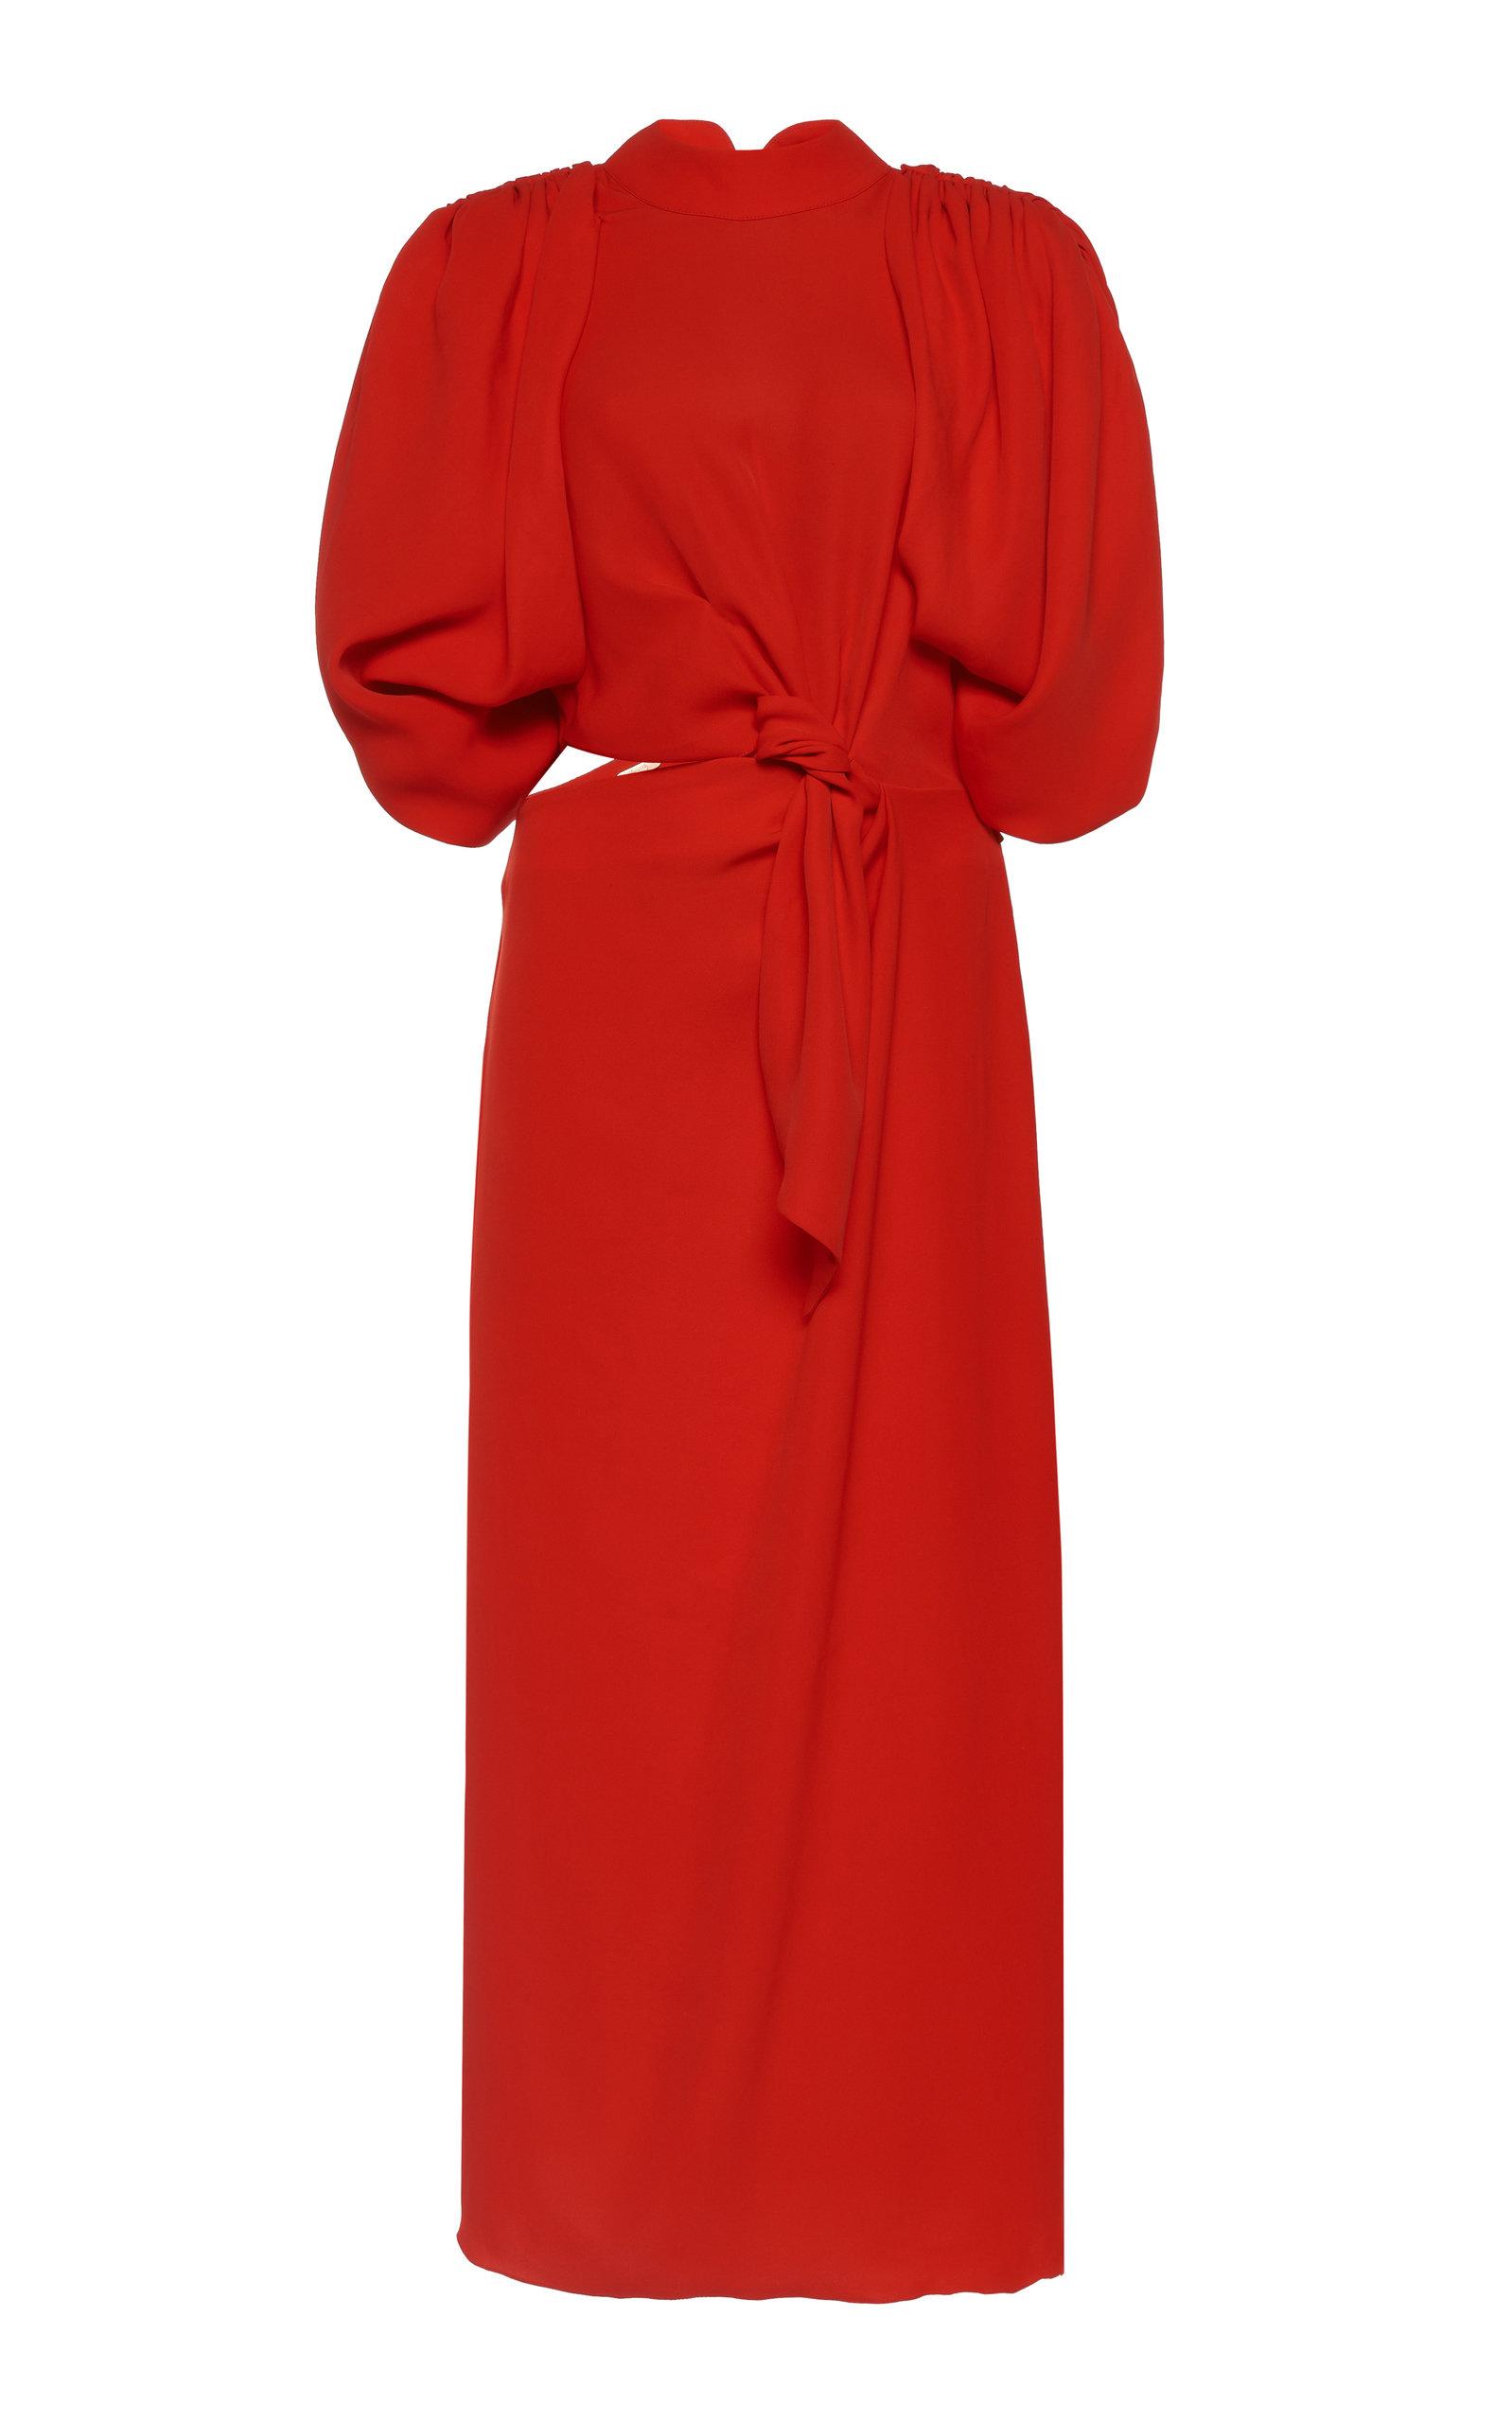 Buy Johanna Ortiz Organic Construction Knotted Silk-Blend Midi Dress online, shop Johanna Ortiz at the best price